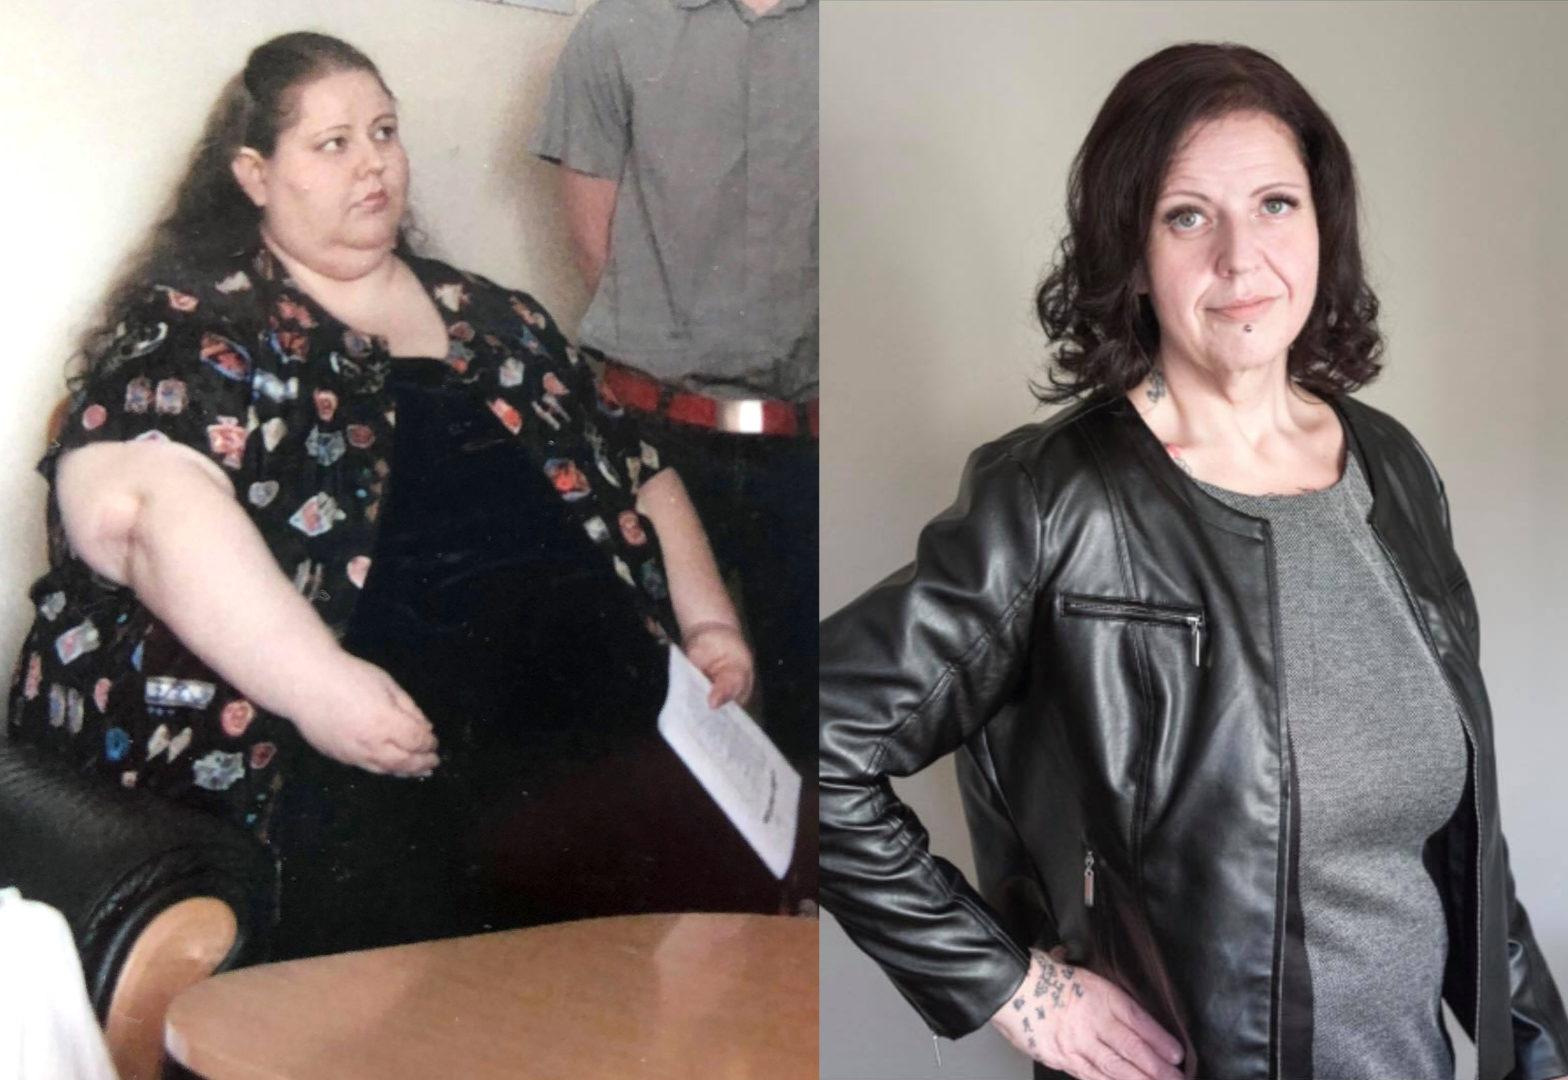 Belinda Kara on laihtunut peräti 150 kiloa